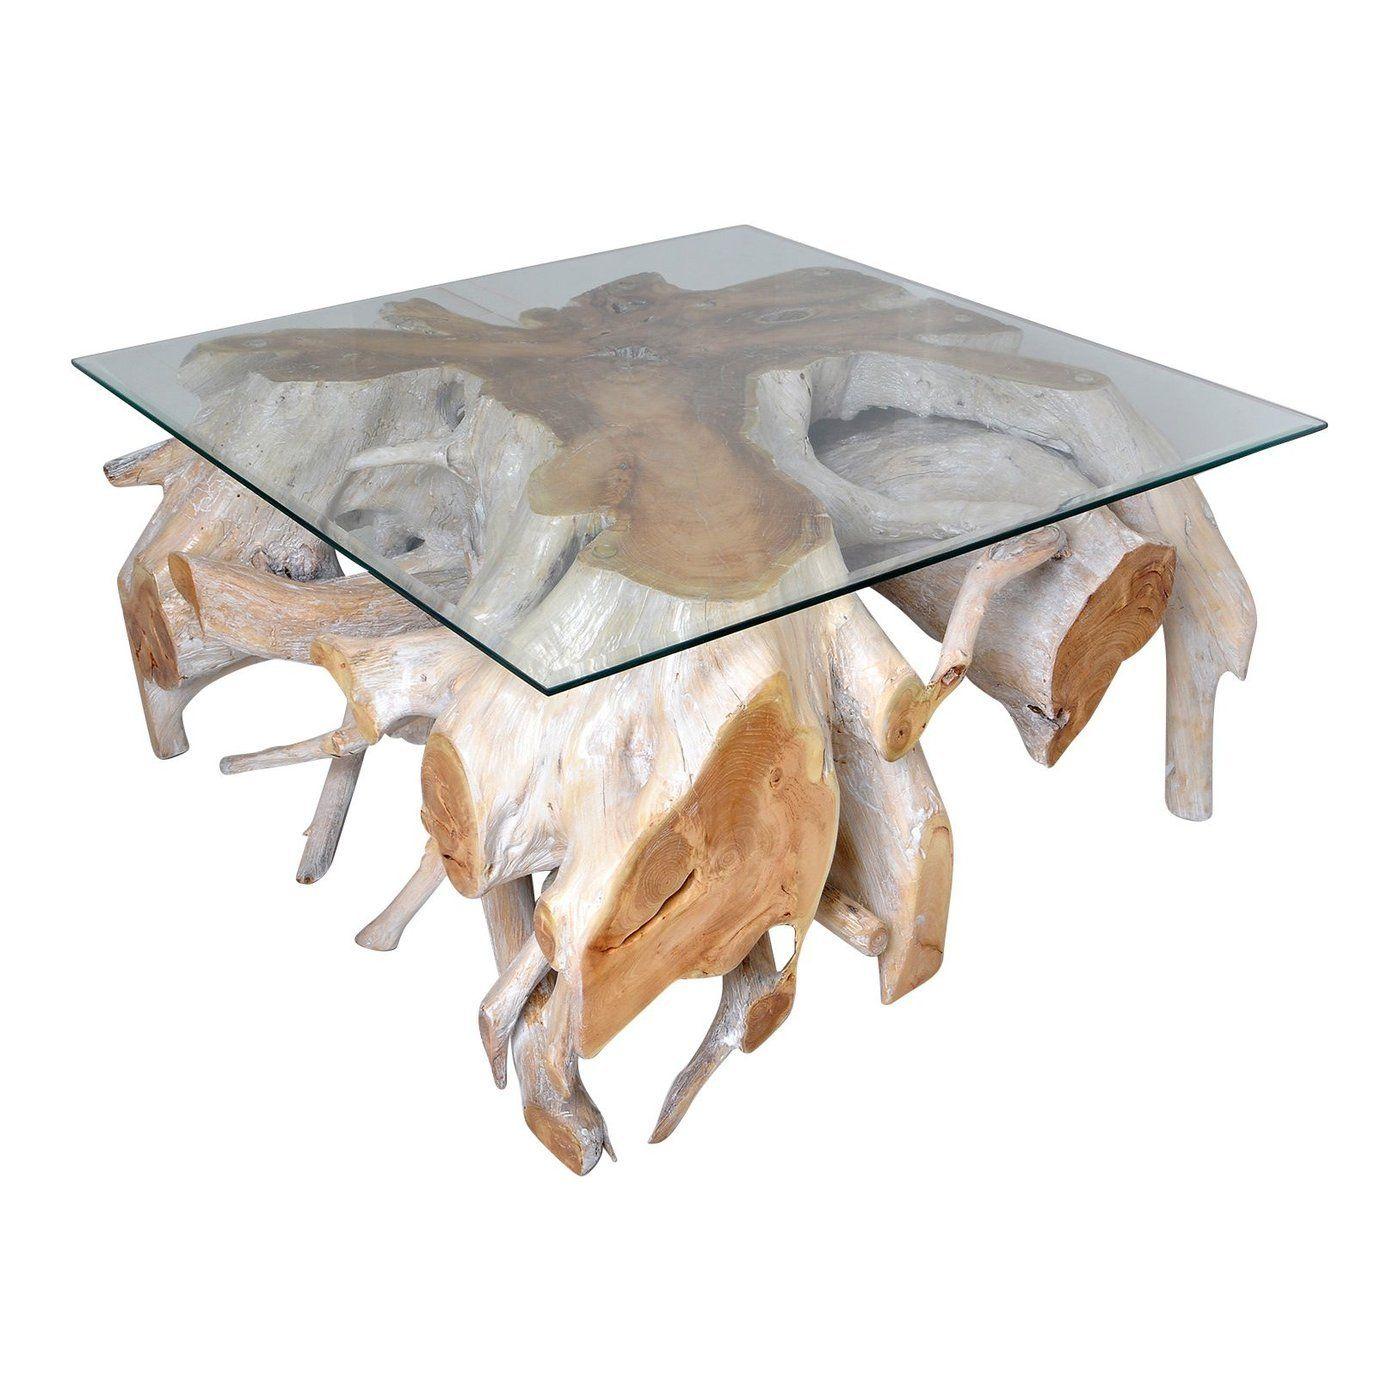 Batu batu teak root coffee table | Whitewash coffee table ...